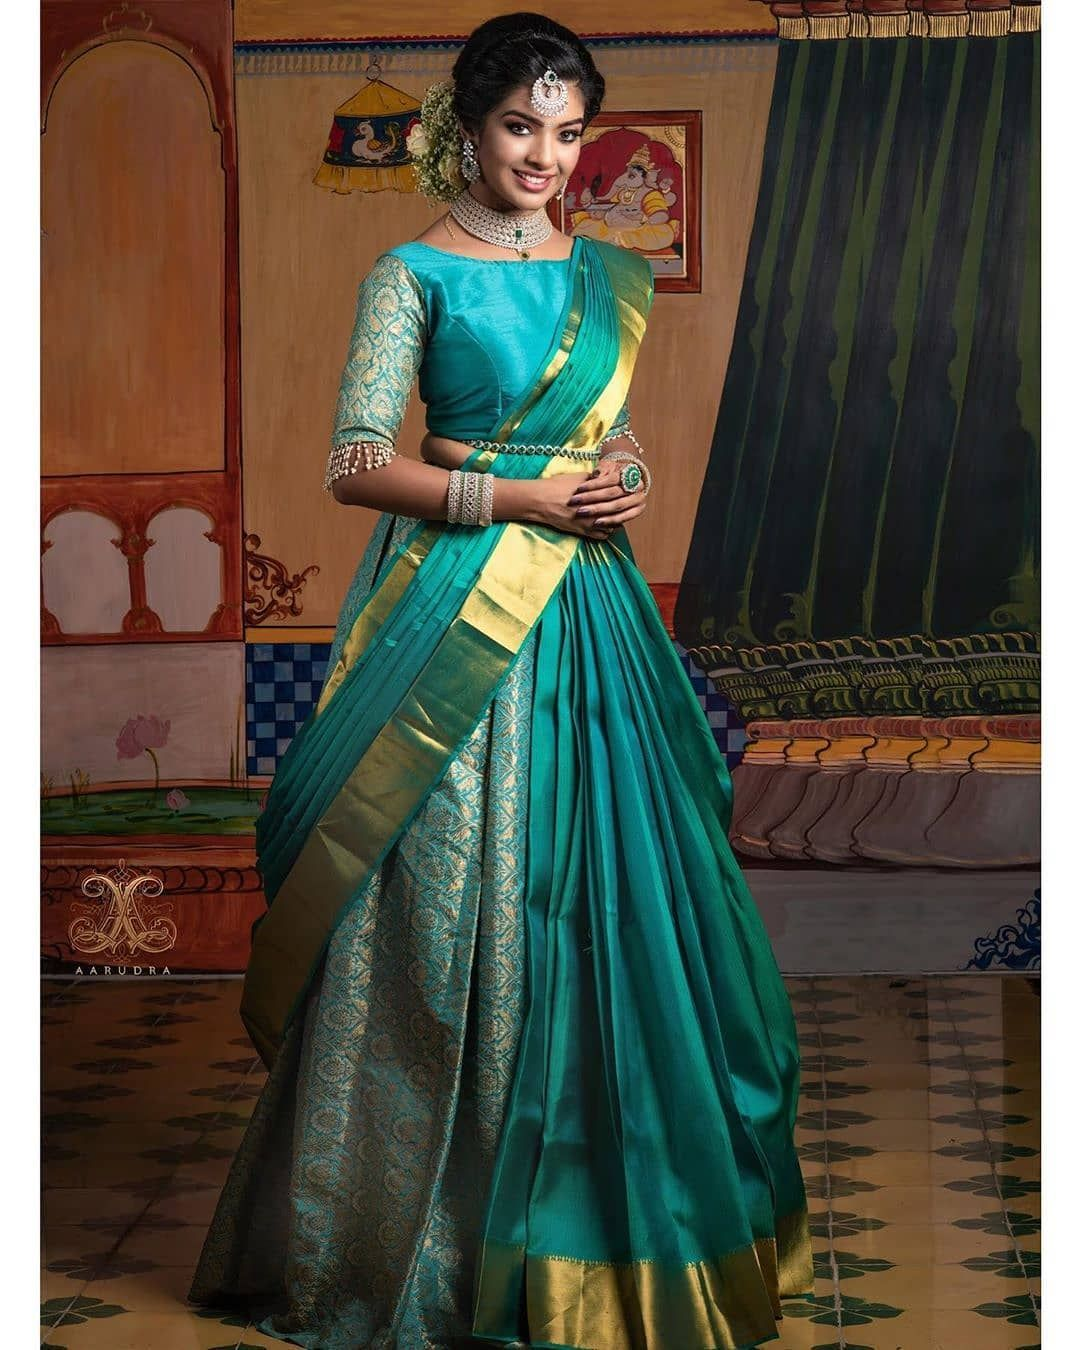 Blouse Designs For Pattu Silk Sarees (88)